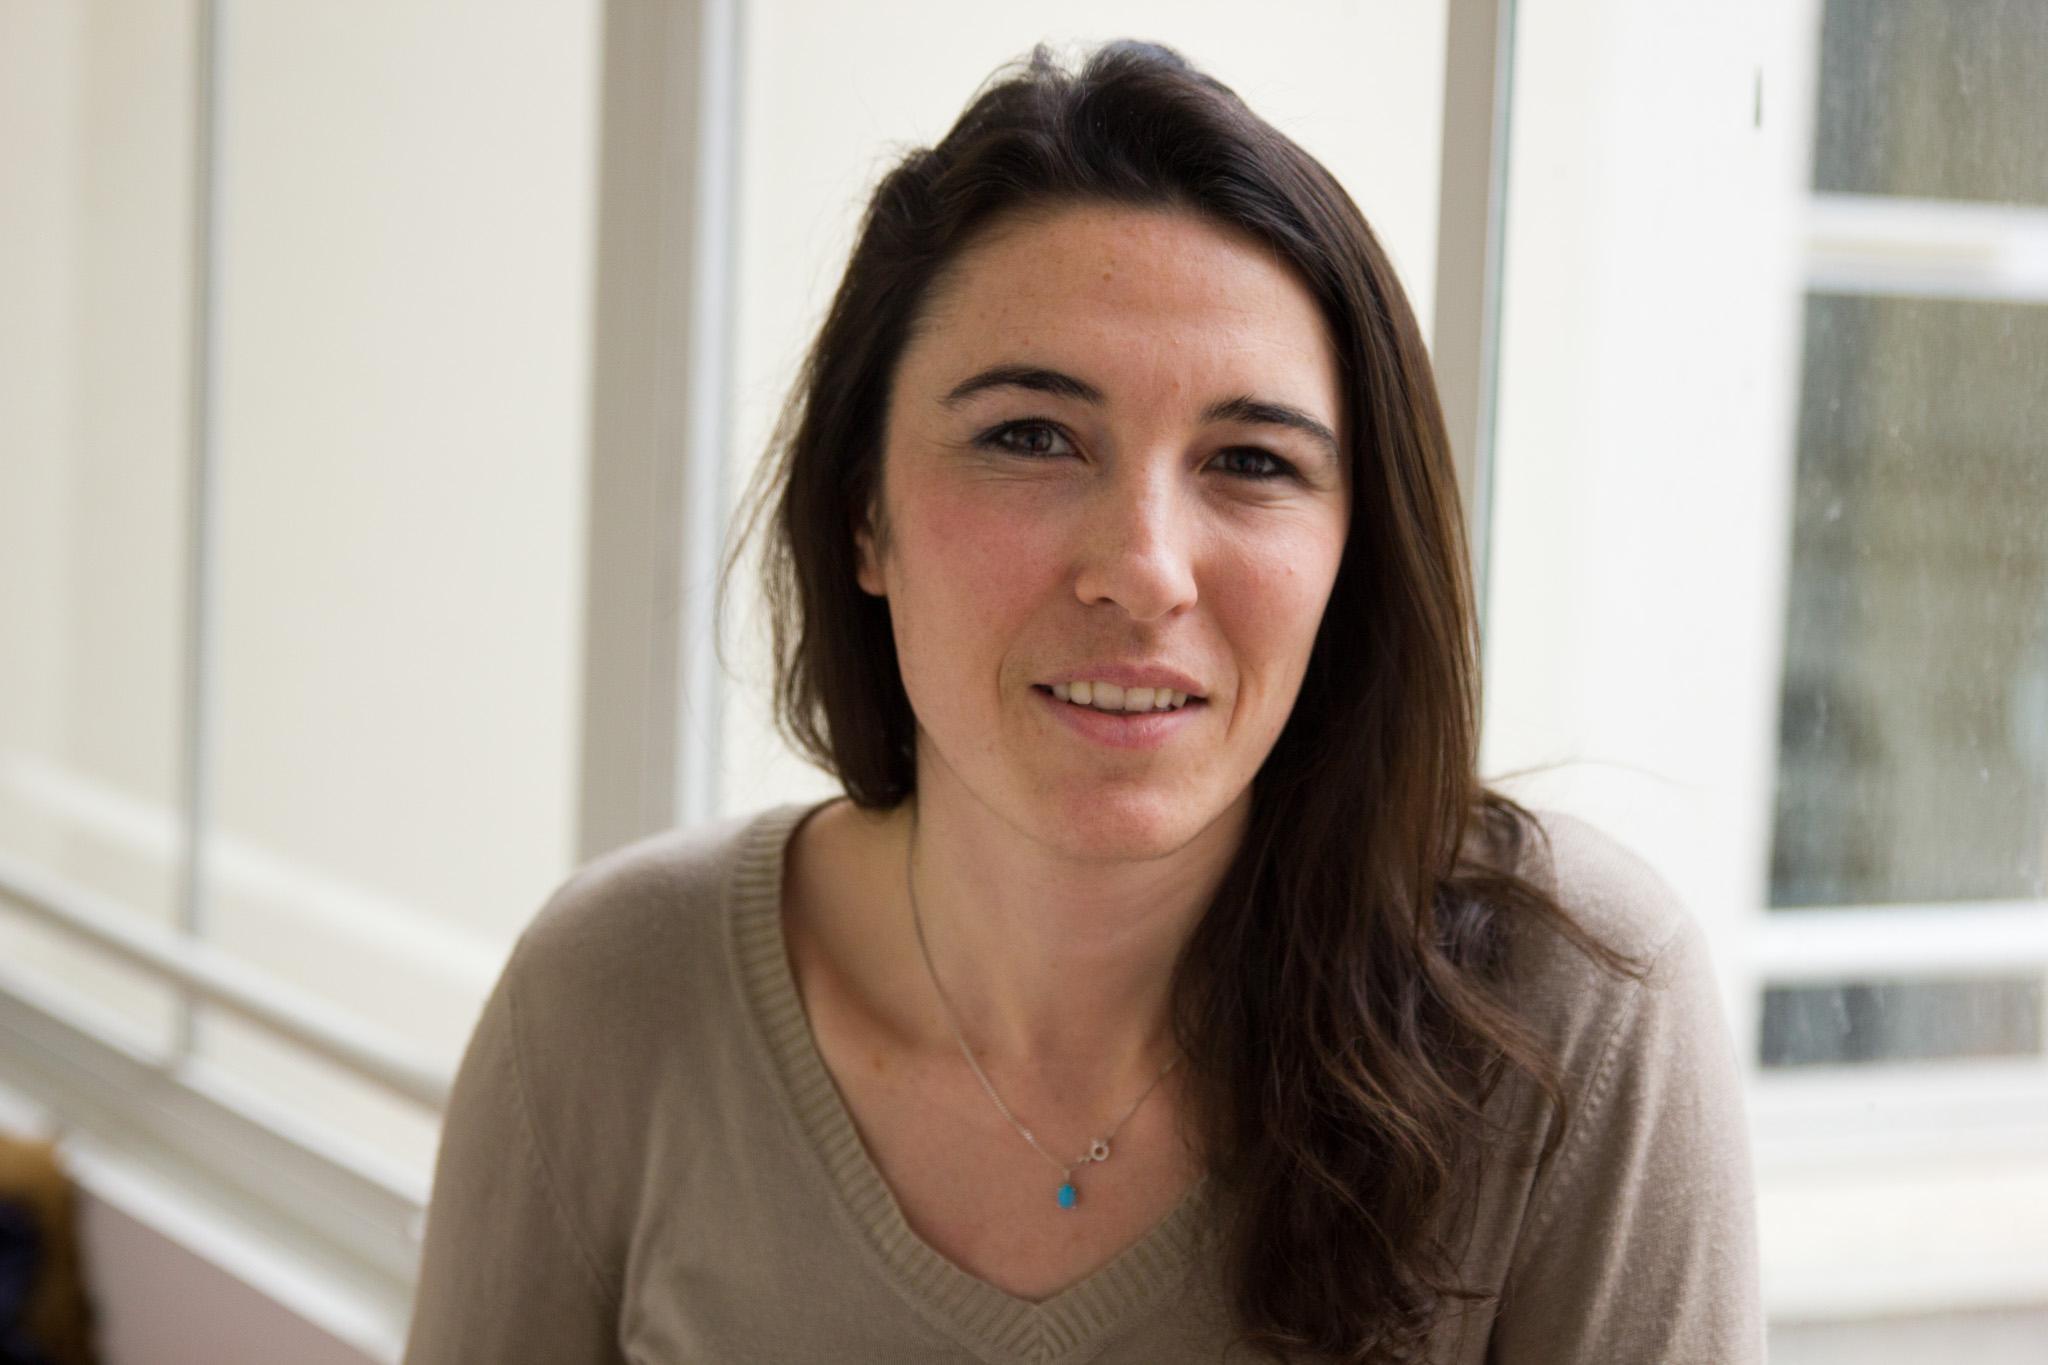 Elise Tavernier